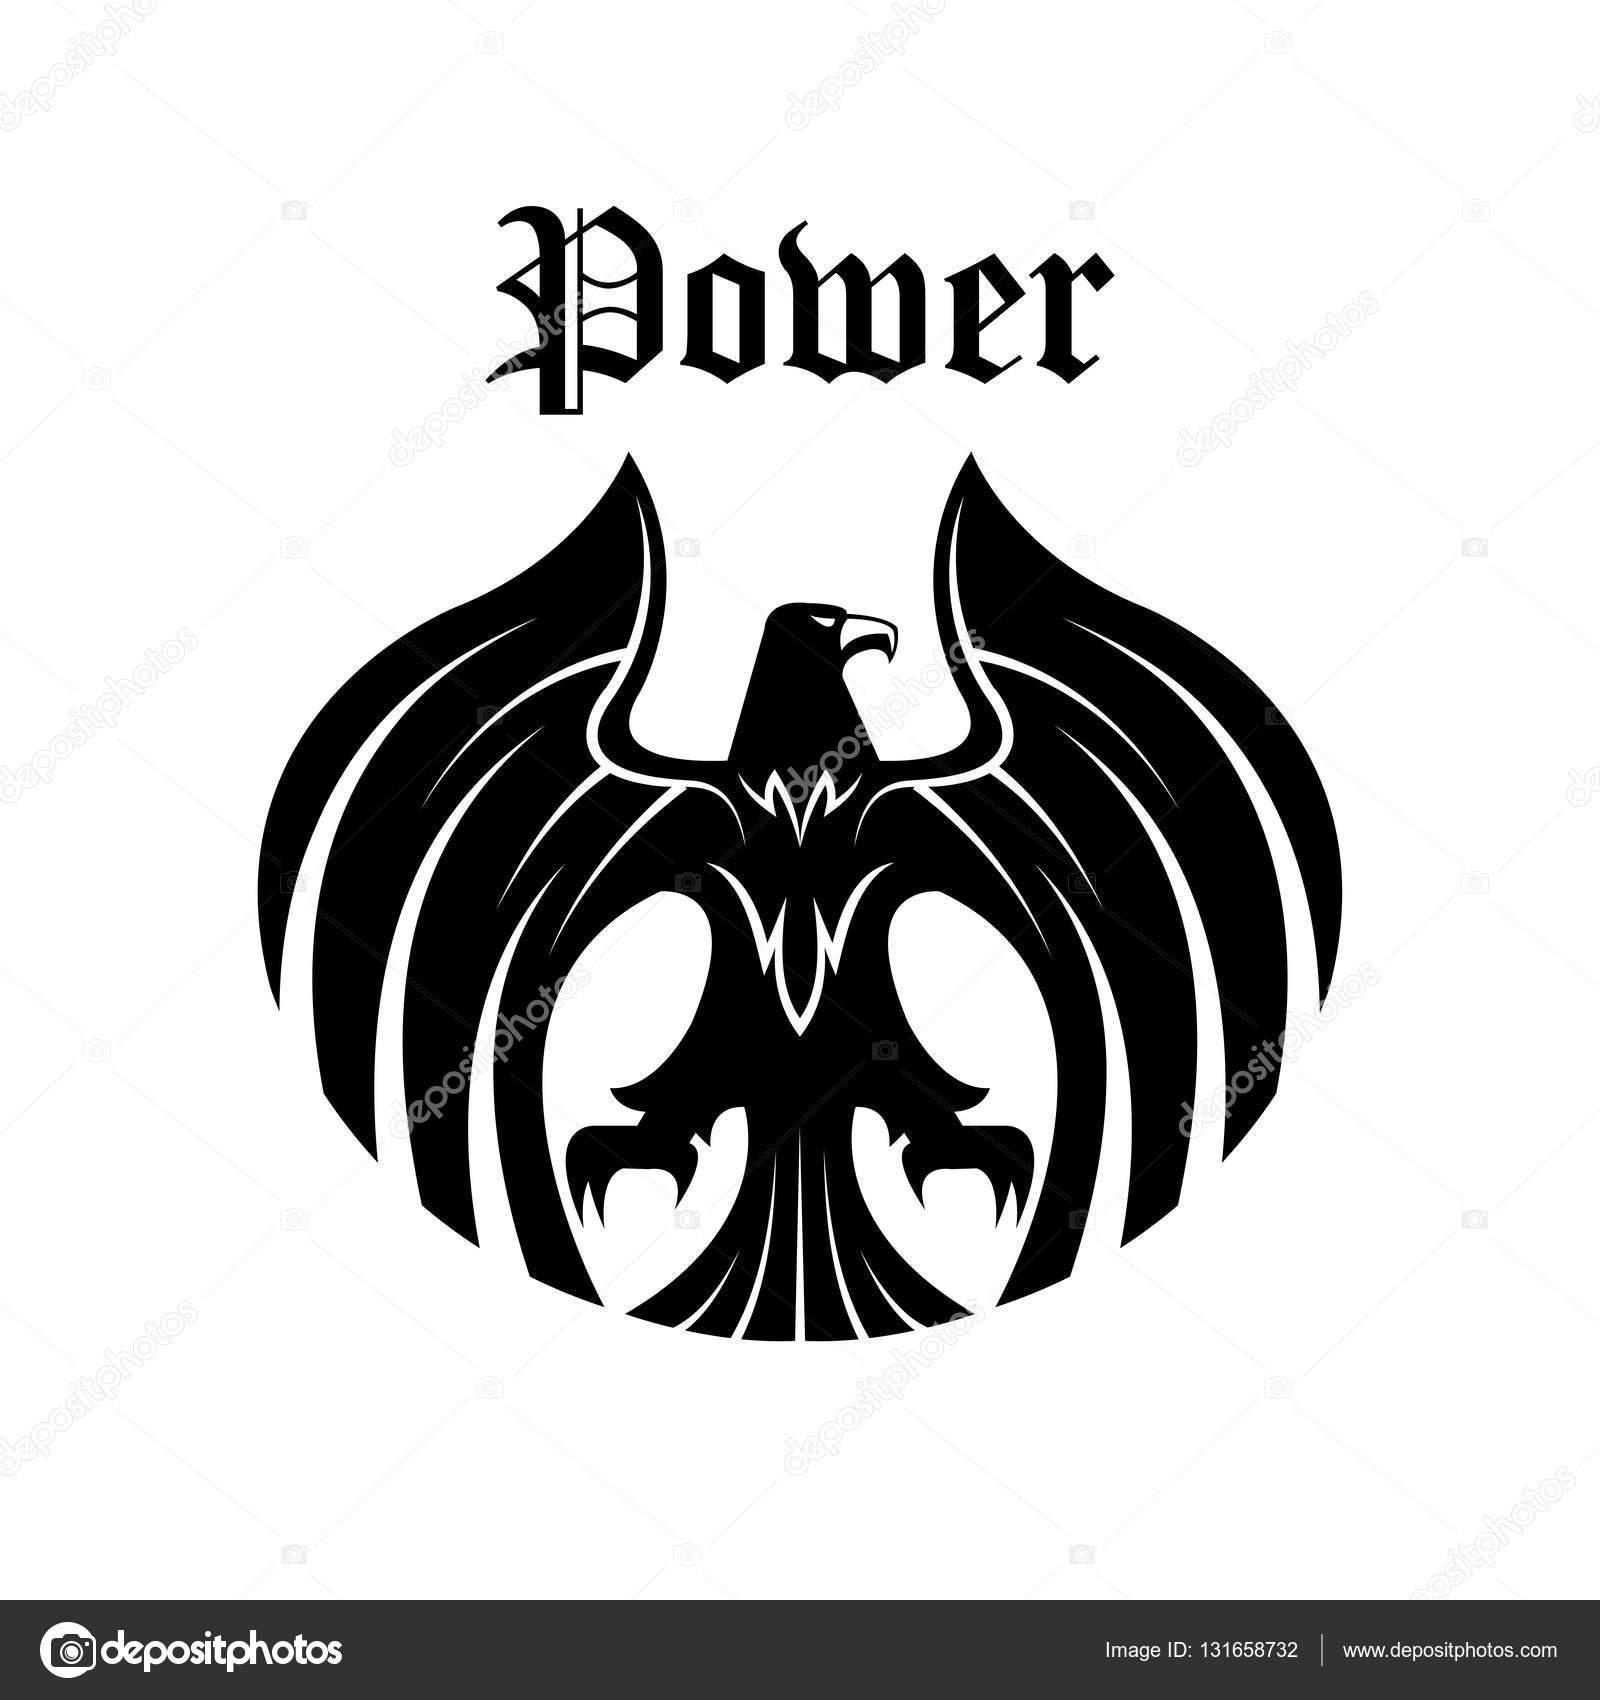 Black eagle round symbol for heraldic design stock vector black eagle round symbol for heraldic design stock vector biocorpaavc Images